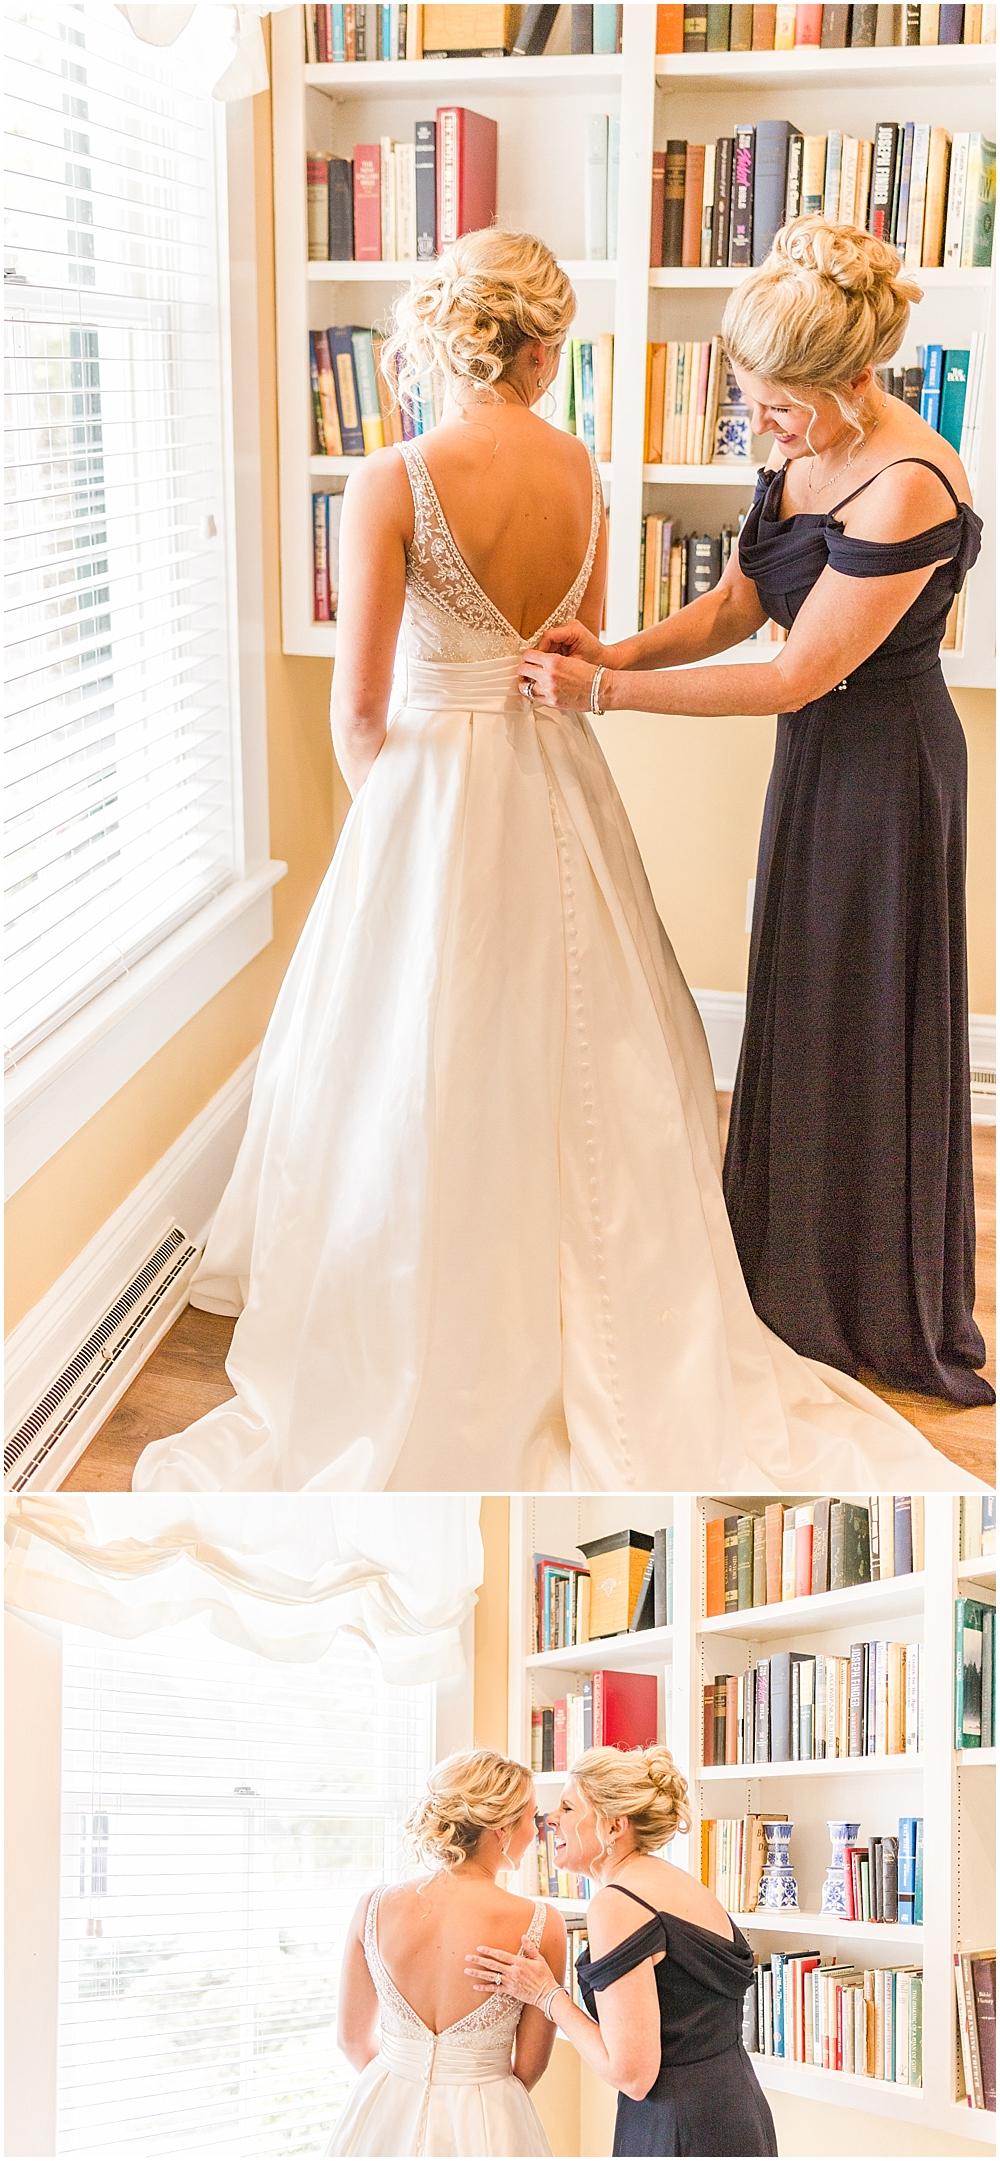 Ashton-Clark-Photography-Wedding-Portrait-Family-Photographer-Mobile-Alabama_0298.jpg